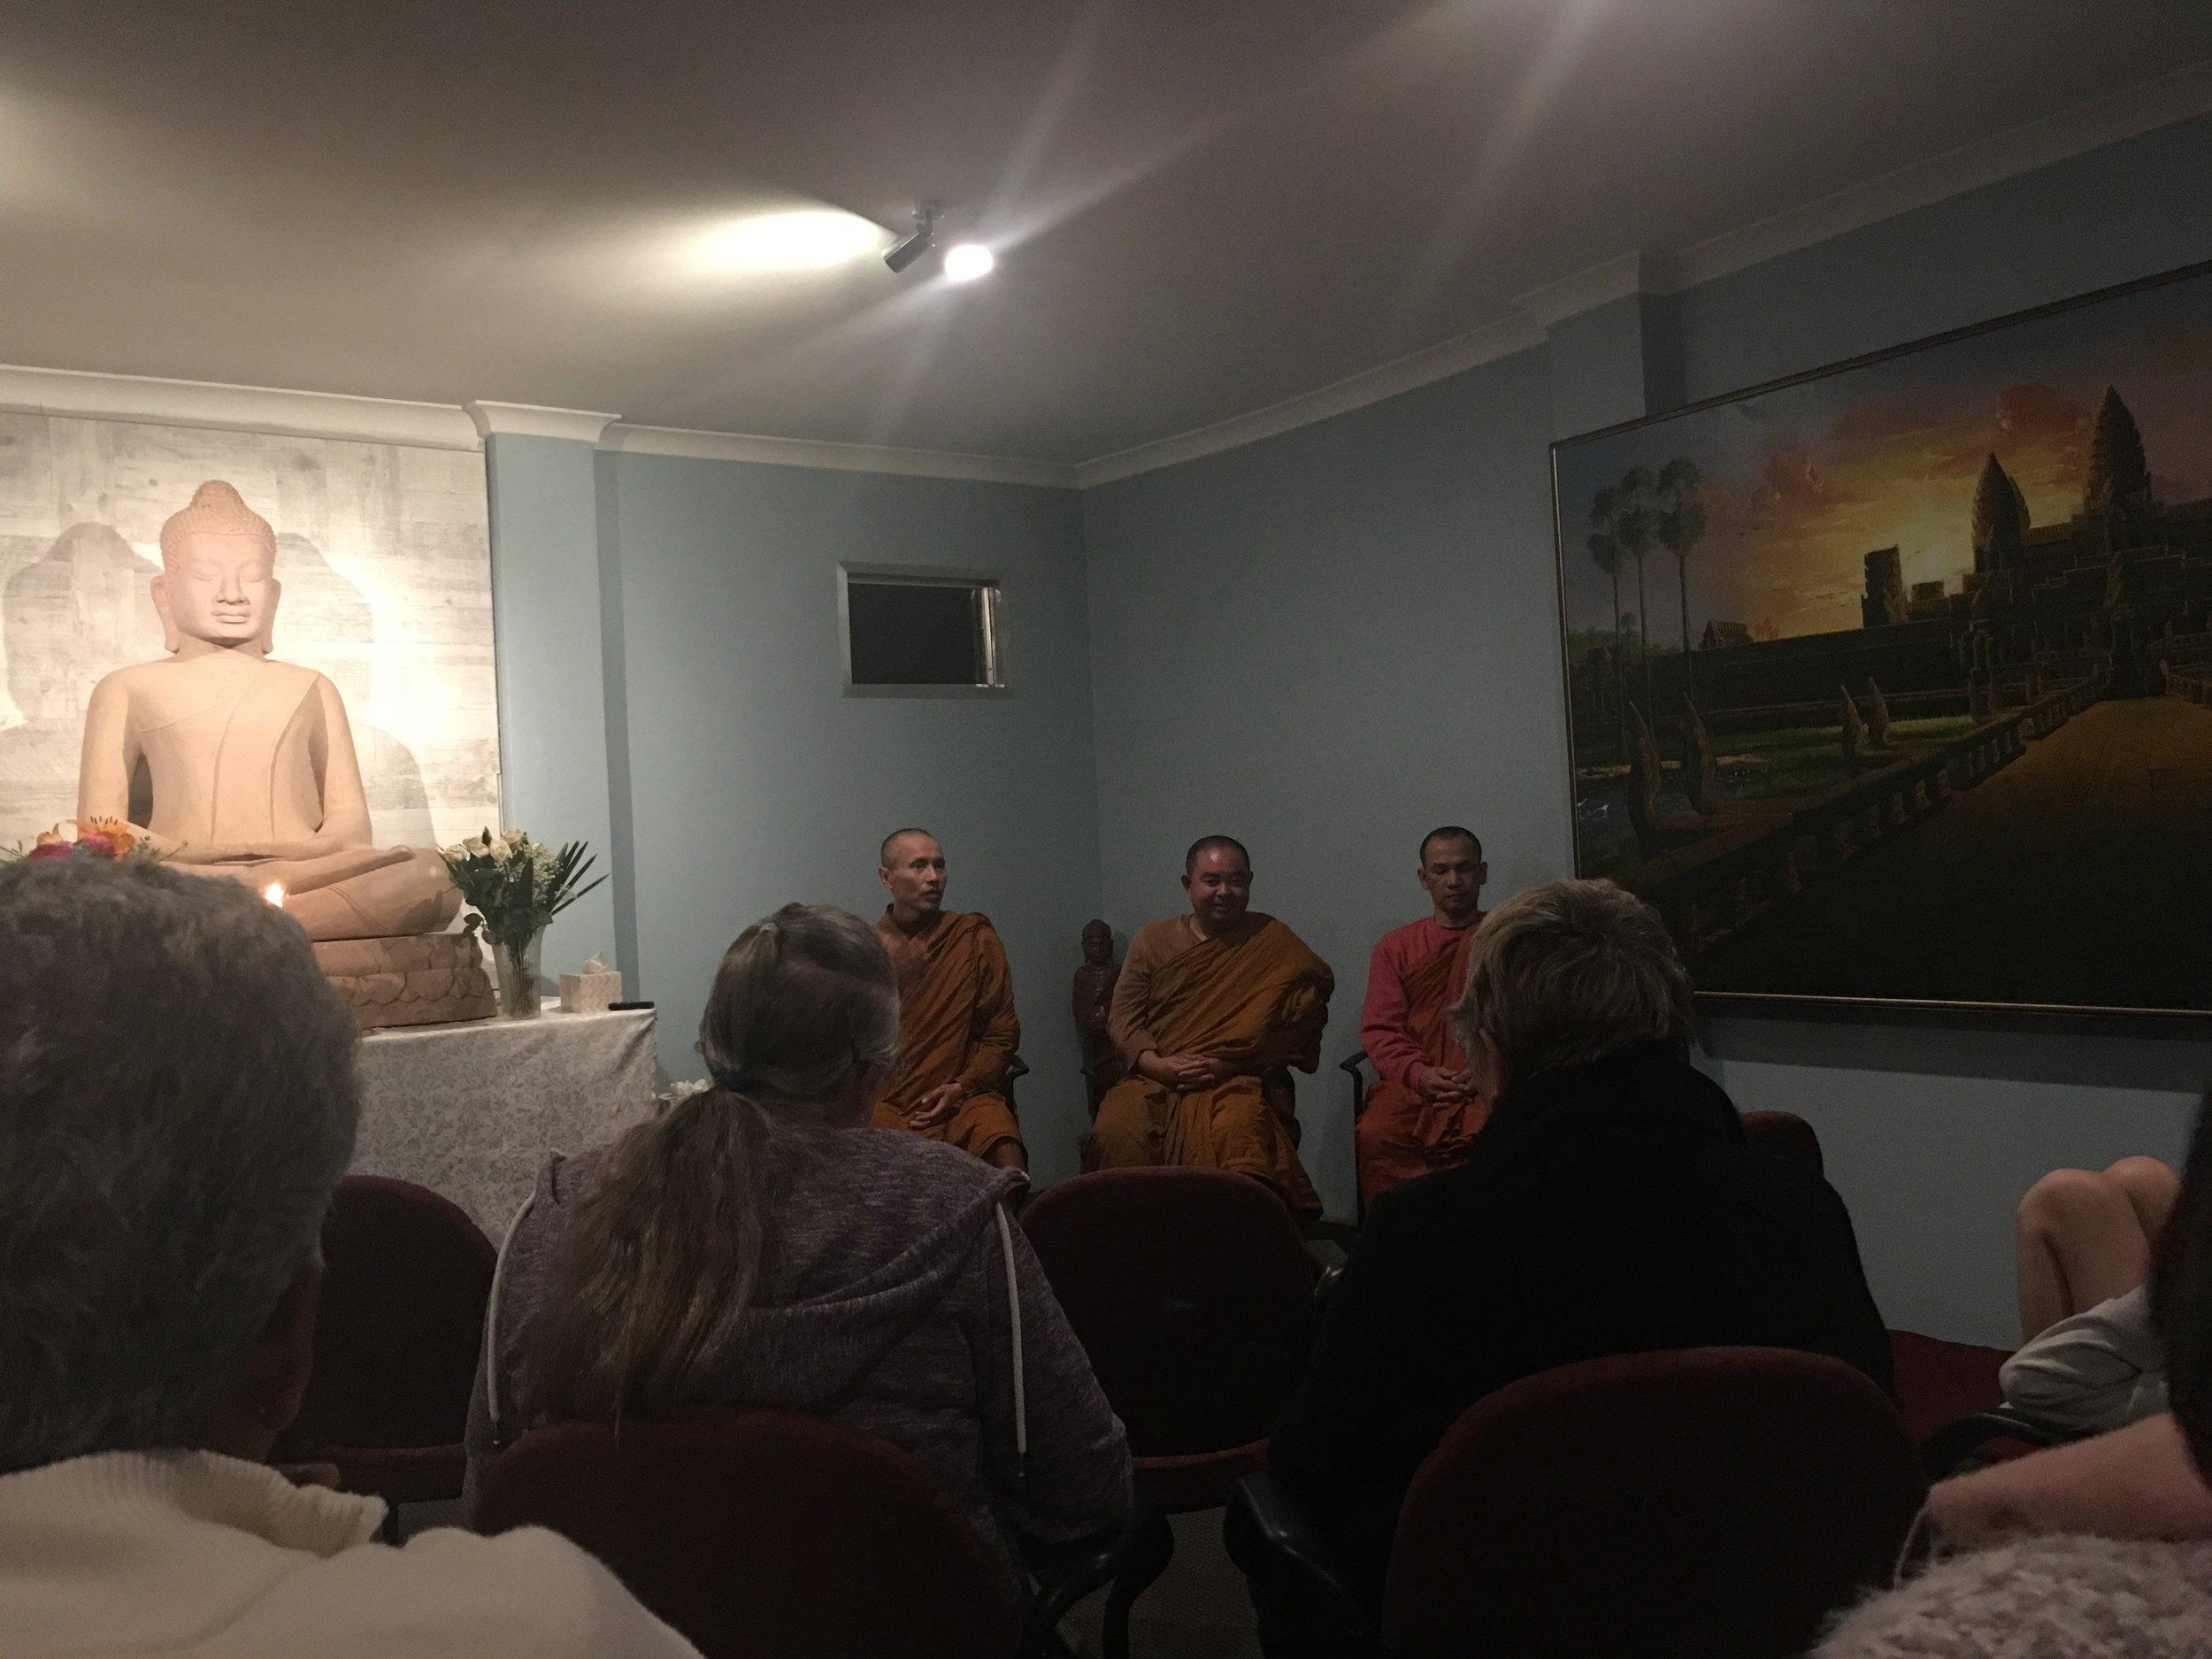 Ajahn Khemavaro giving a Dhamma talk and guided meditation.